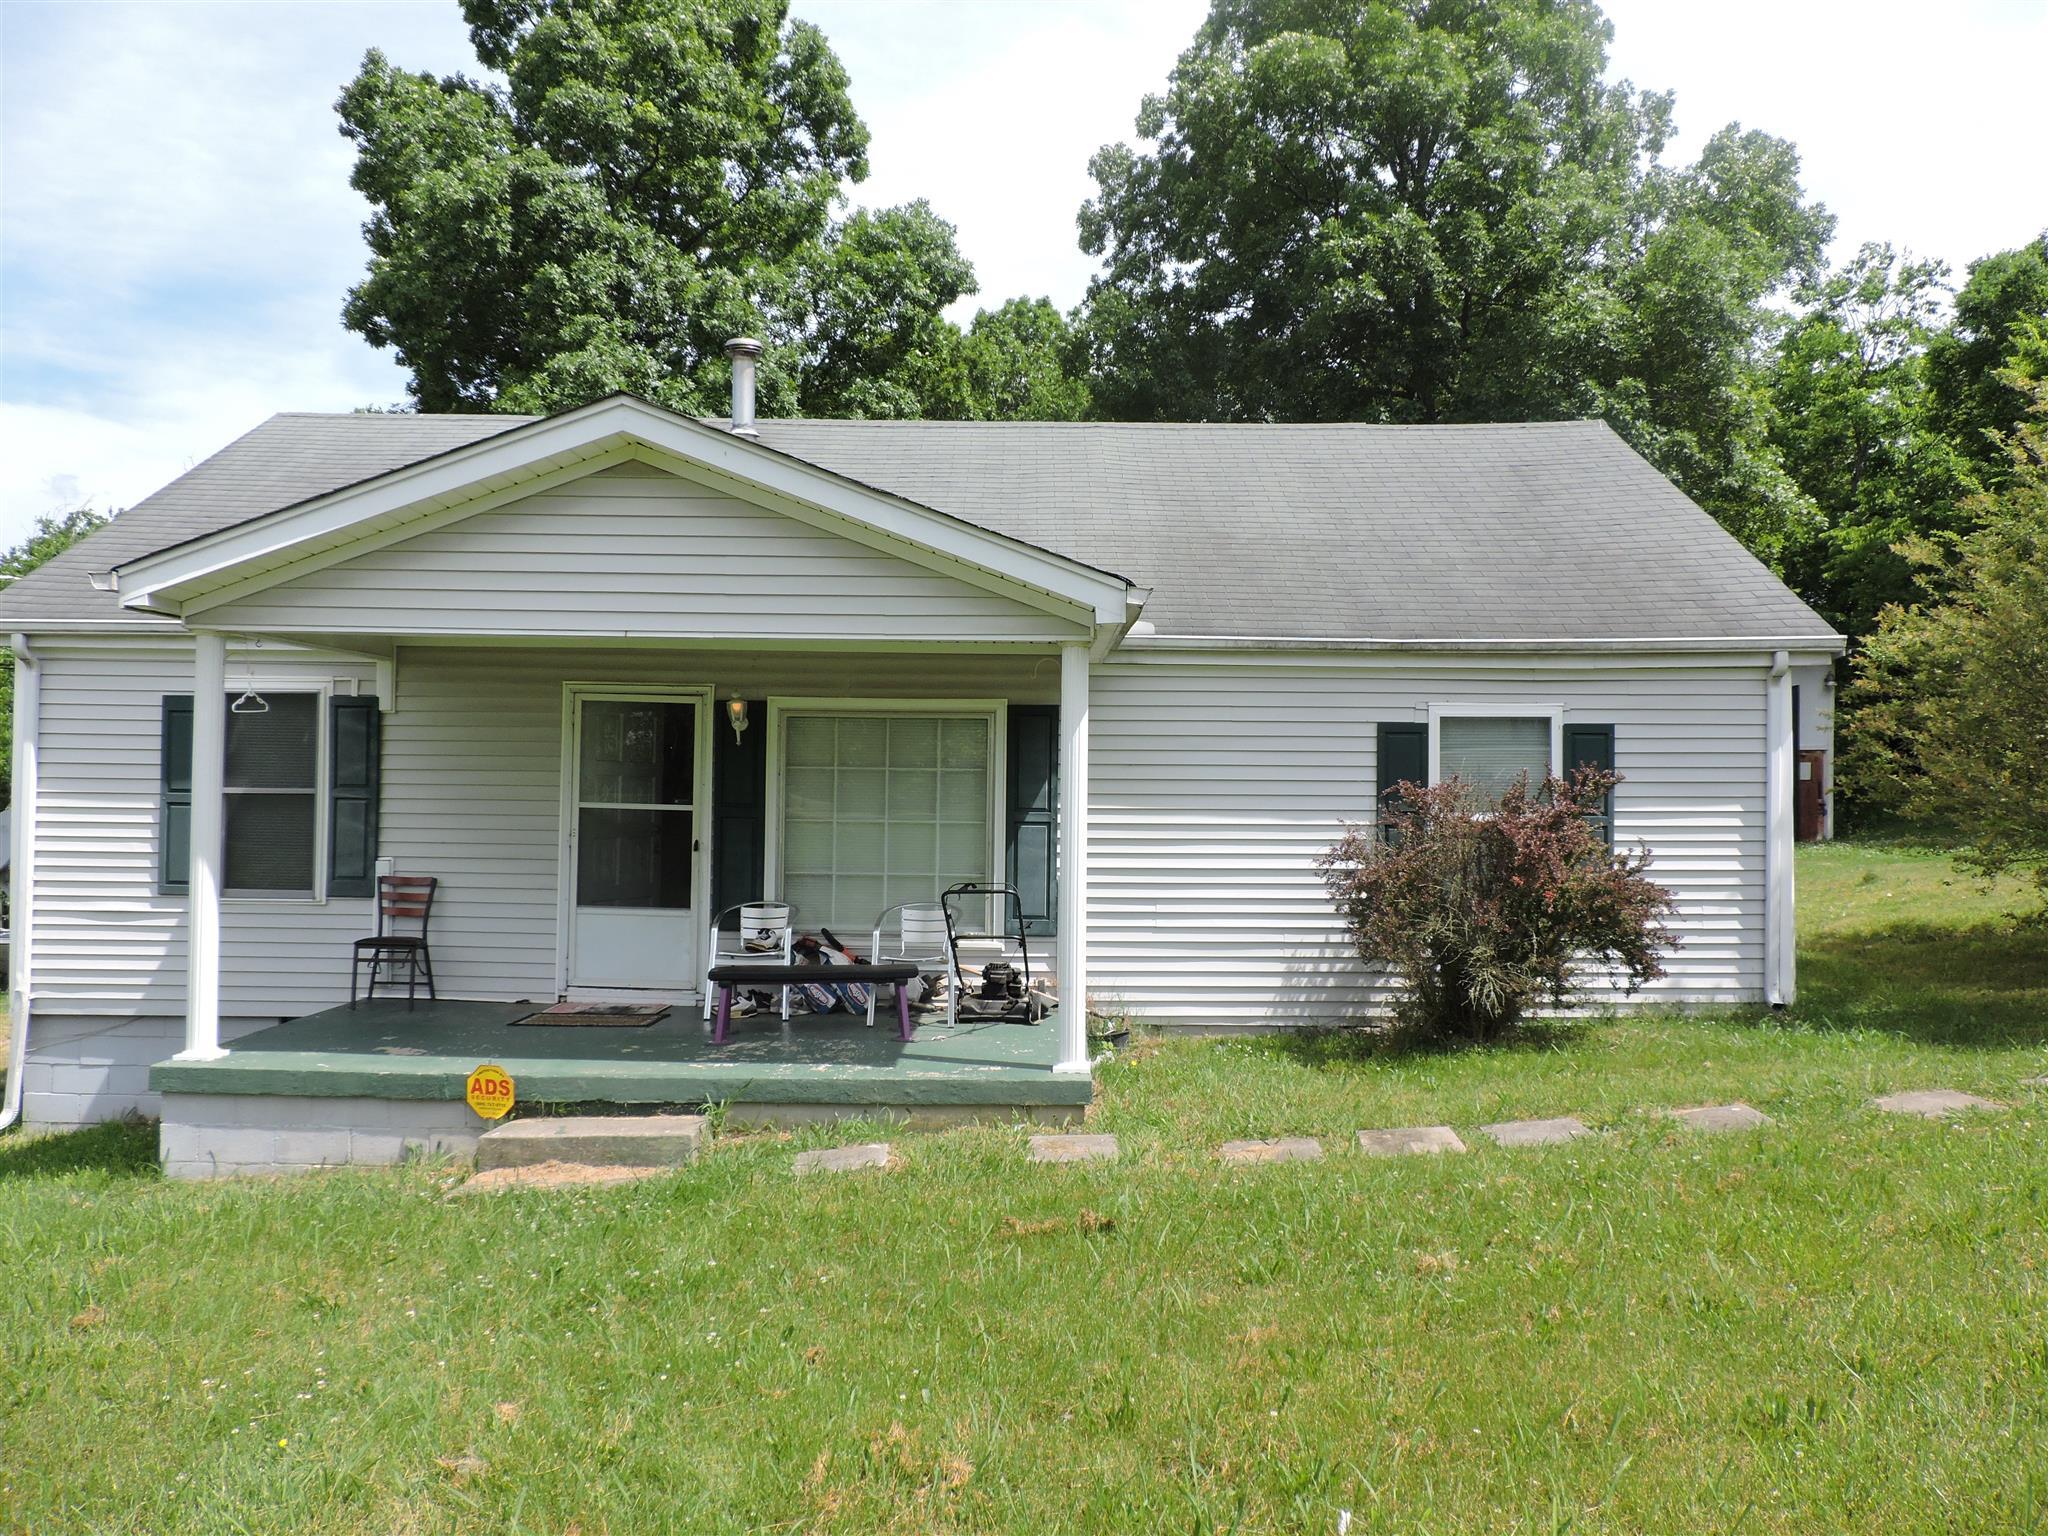 276 Jefferson Pike, LA VERGNE, TN 37086 - LA VERGNE, TN real estate listing